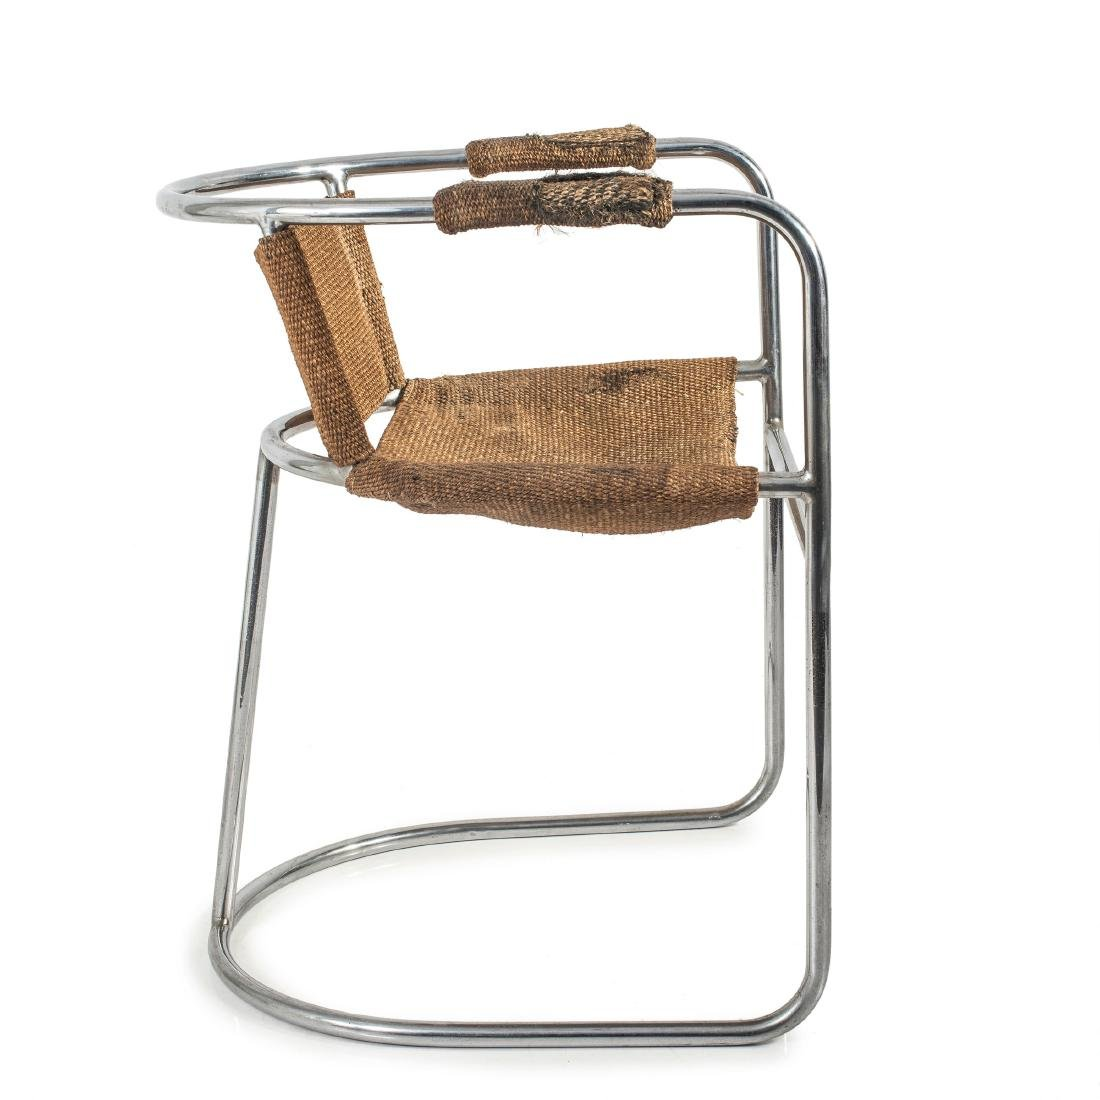 Tubular steel chair c. 1938